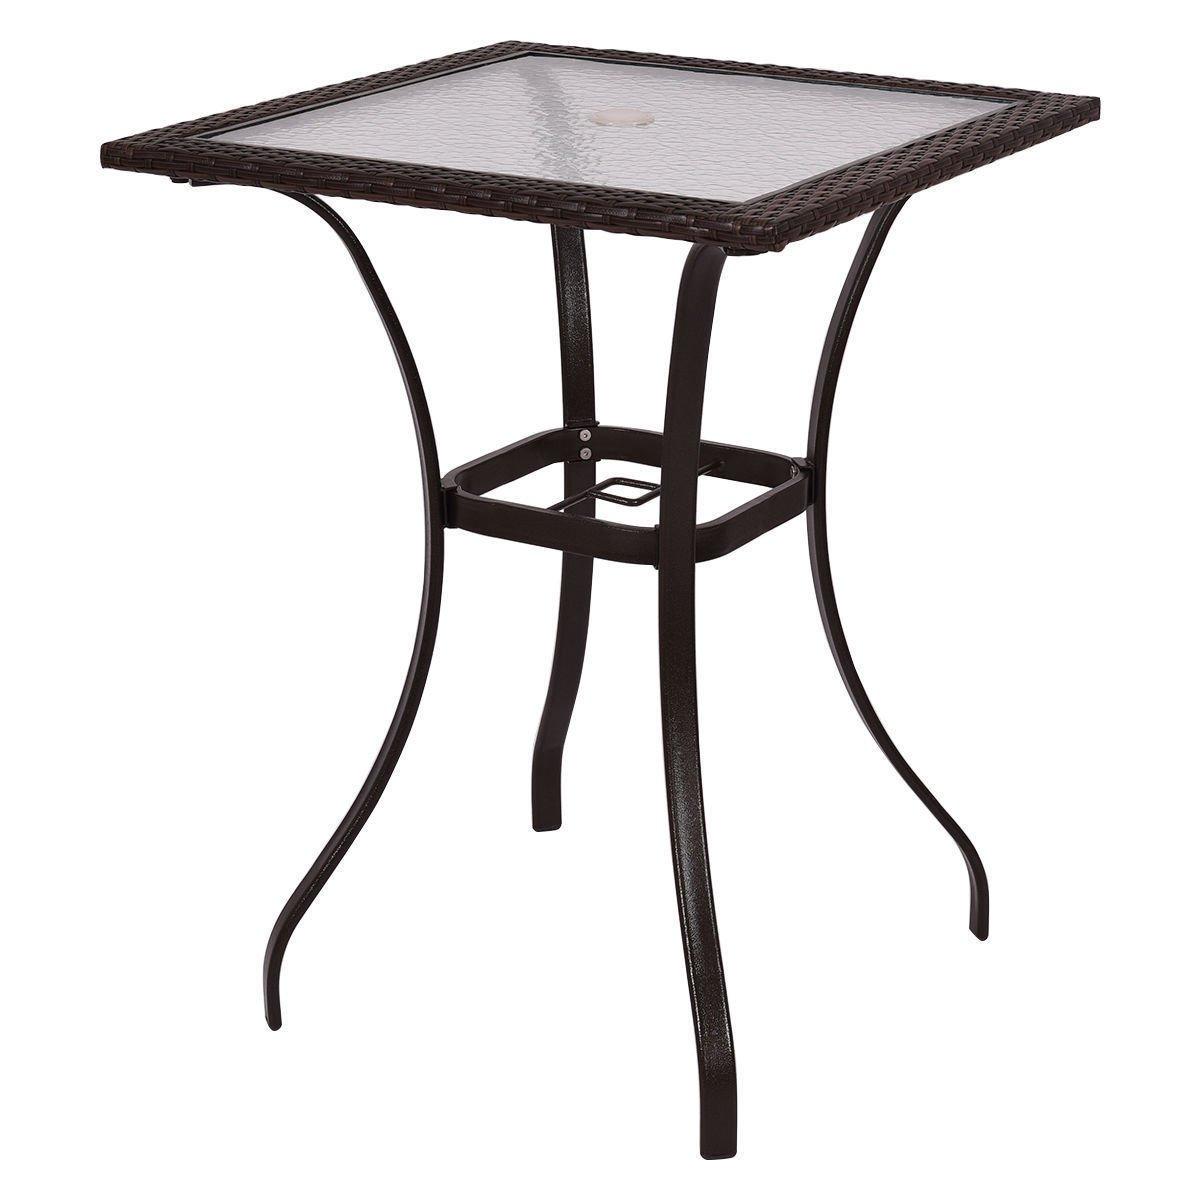 GoodGoods LLC Bar Square Table Glass Modern and Useful Outdoor Patio Rattan Wicker Top Yard Garden Furniture New